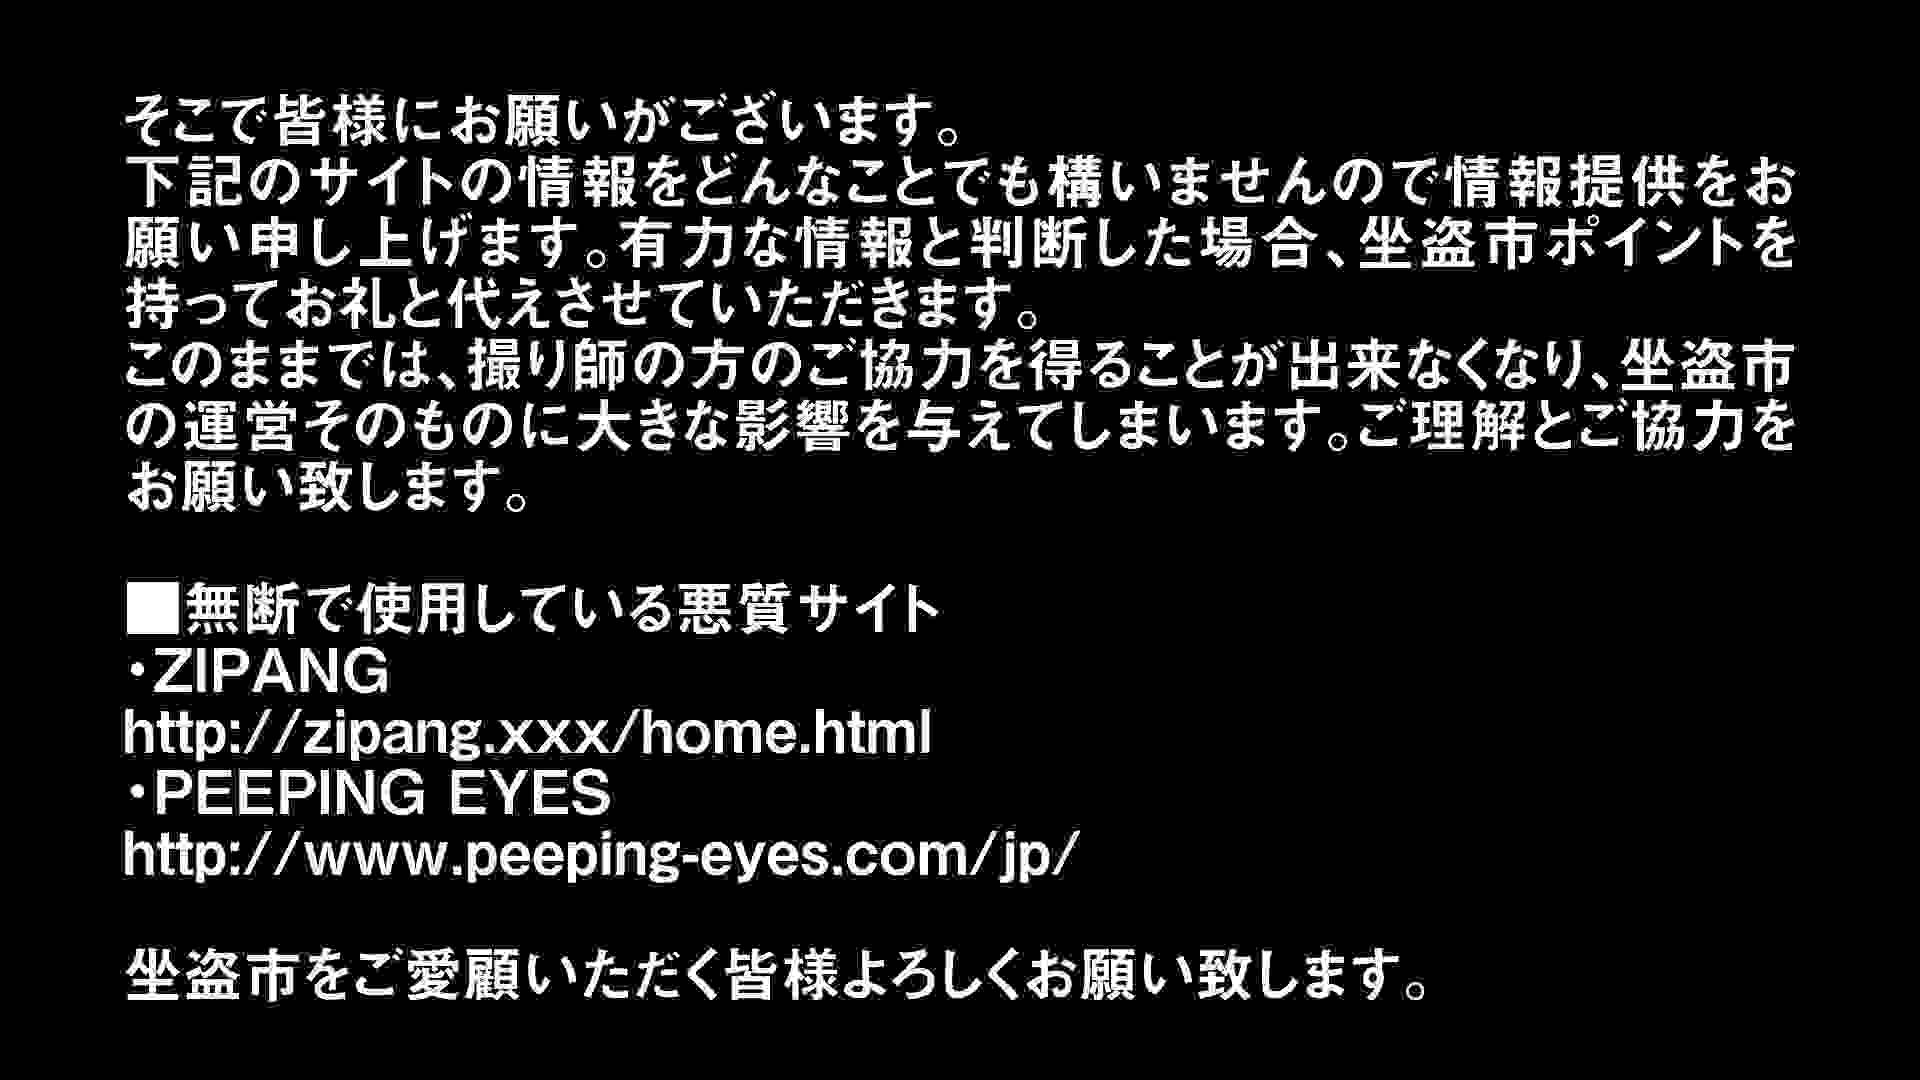 Aquaな露天風呂Vol.294 OLセックス | 盗撮  75画像 34